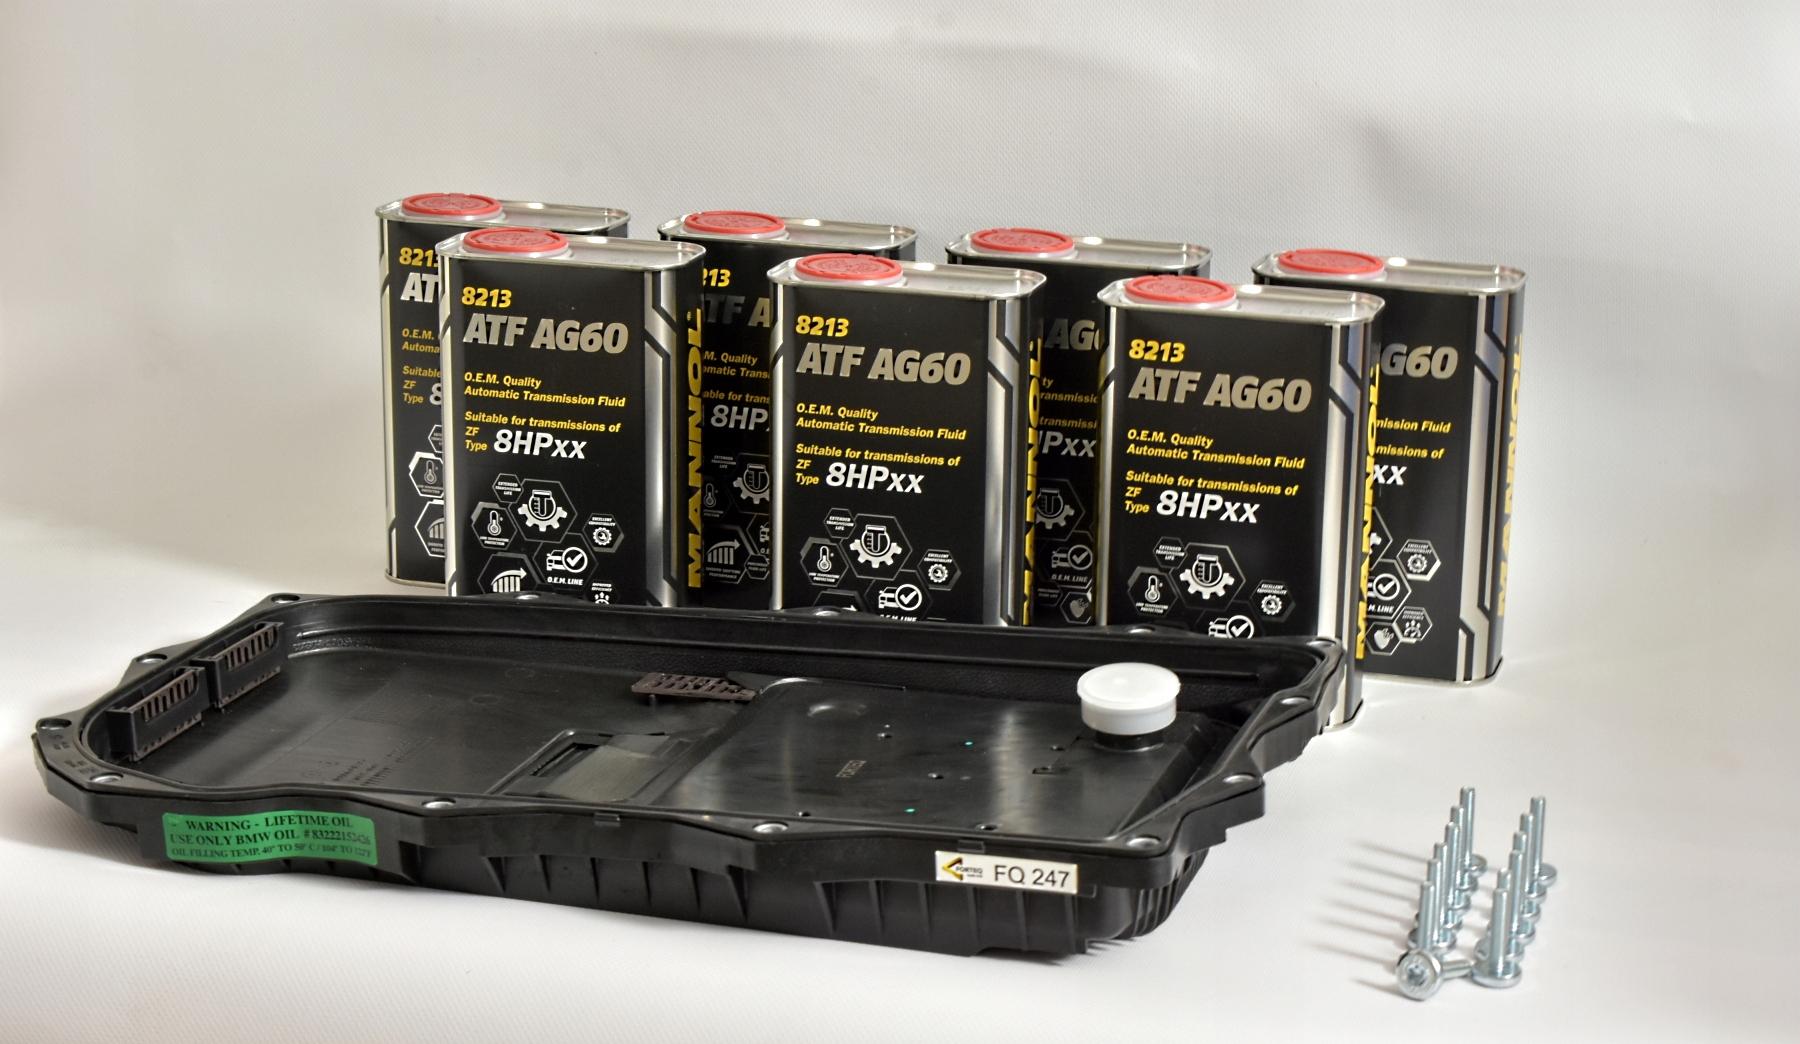 bmw 5 f10 zf 8hp комплект к обмен масла автомат